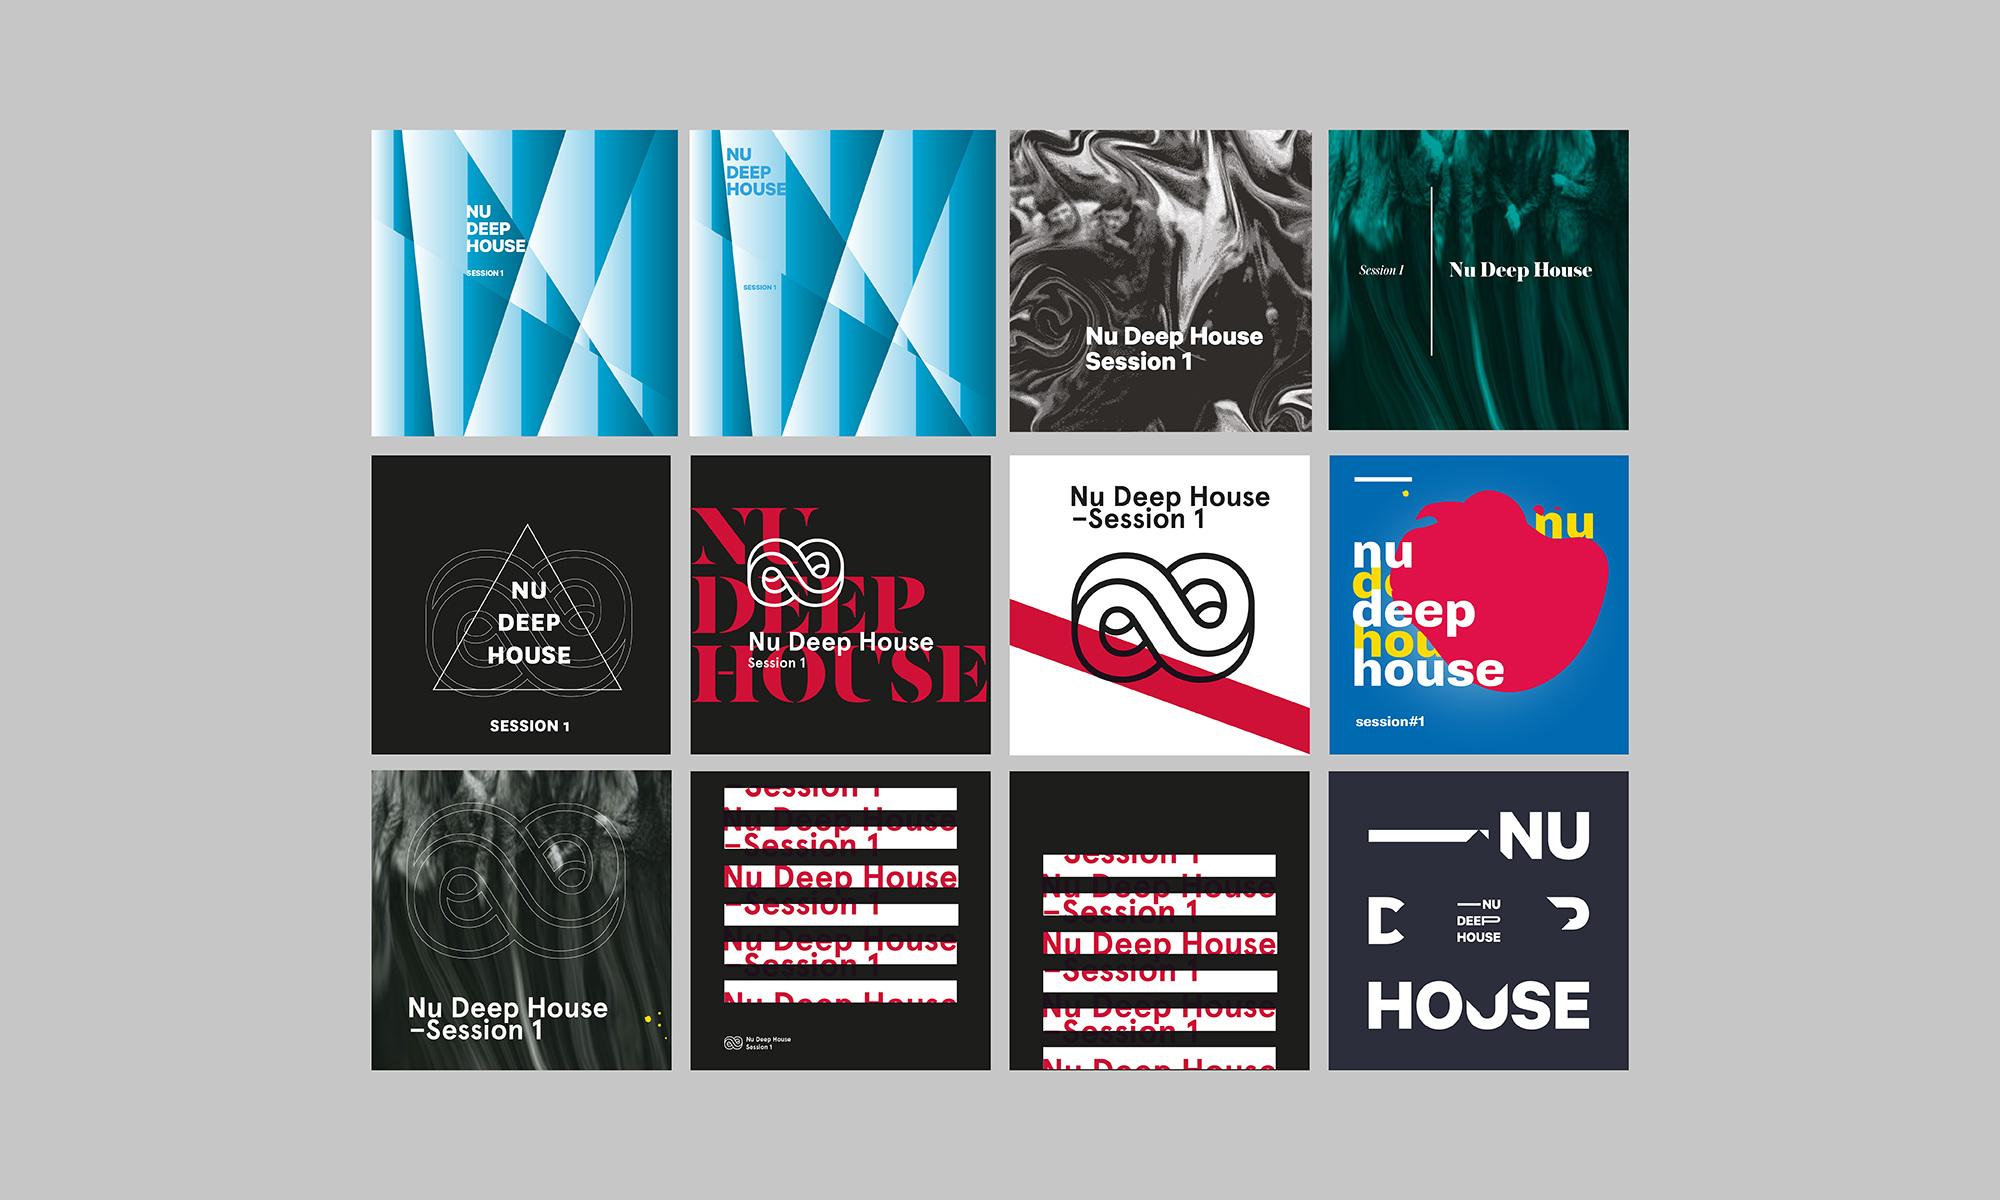 Nu Deep House - Canefantasma / Mimmo Manes Nu Design House on omega house, asia house, pm house, tk house, hr house, museum house, er house, sigma house, na house, fu house, arc house,